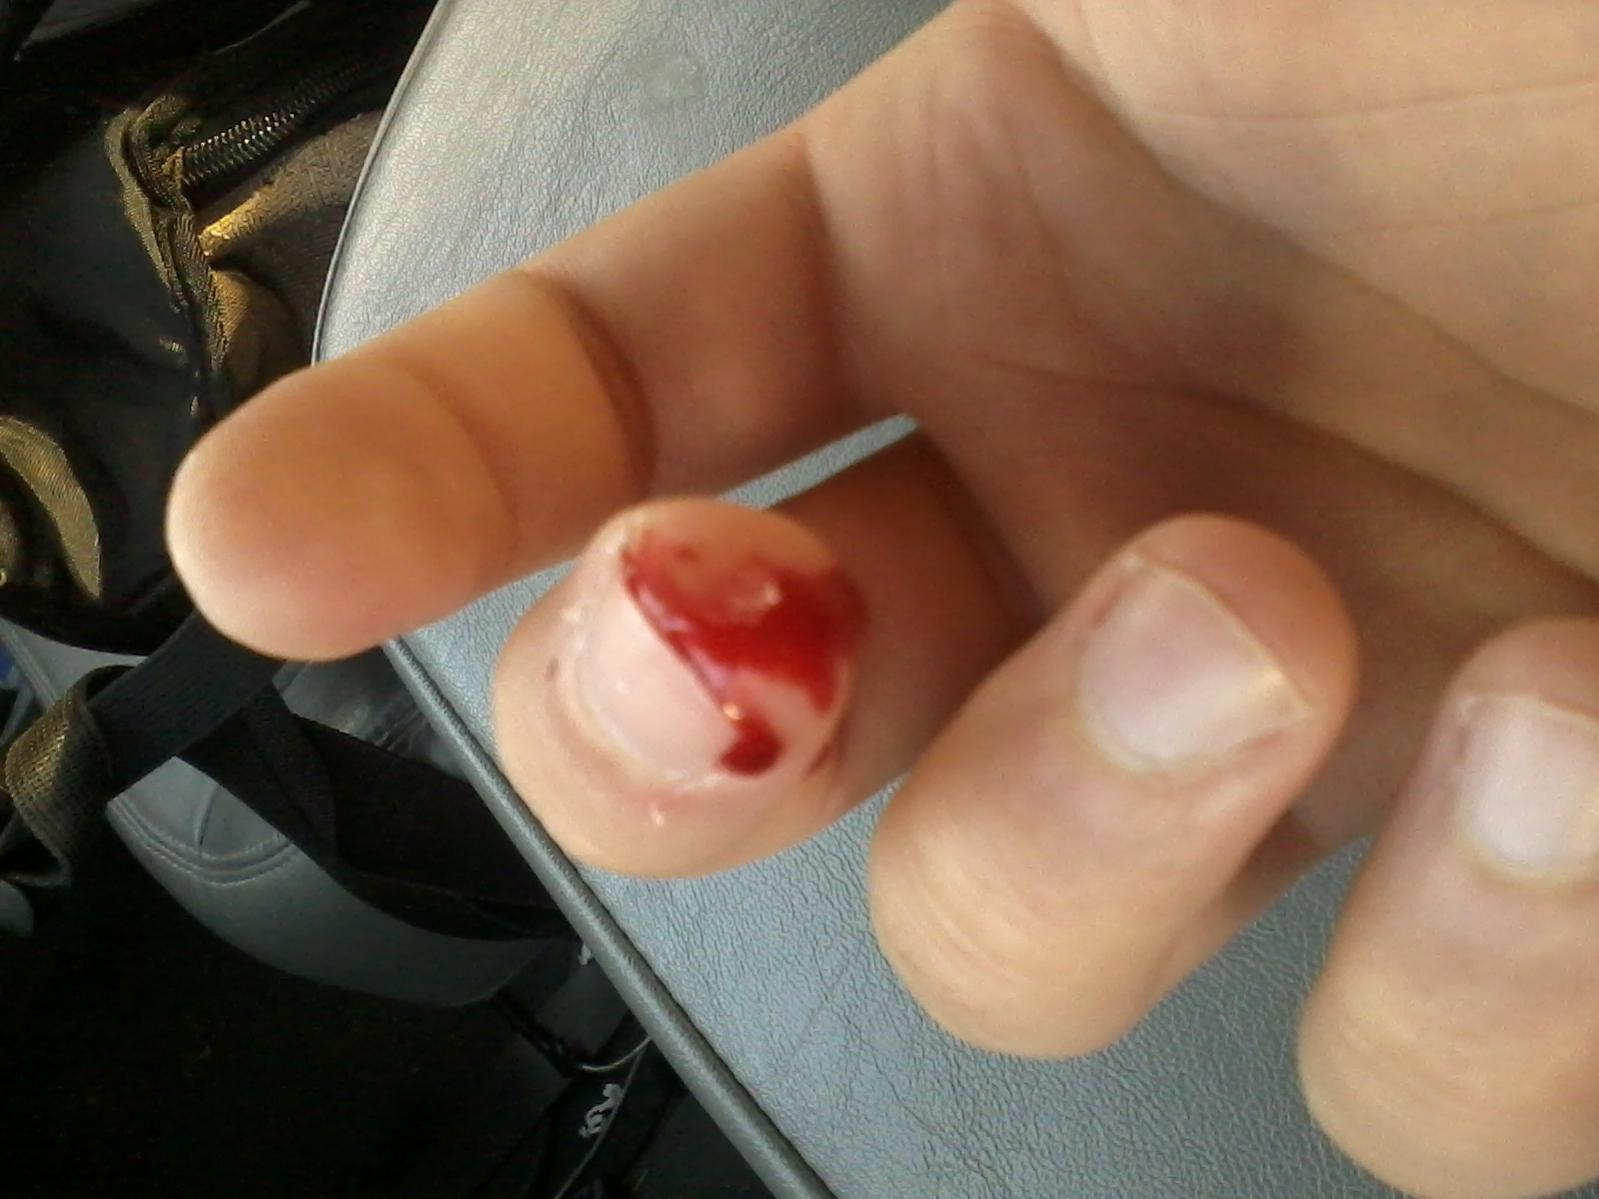 Cut tip of thumb off